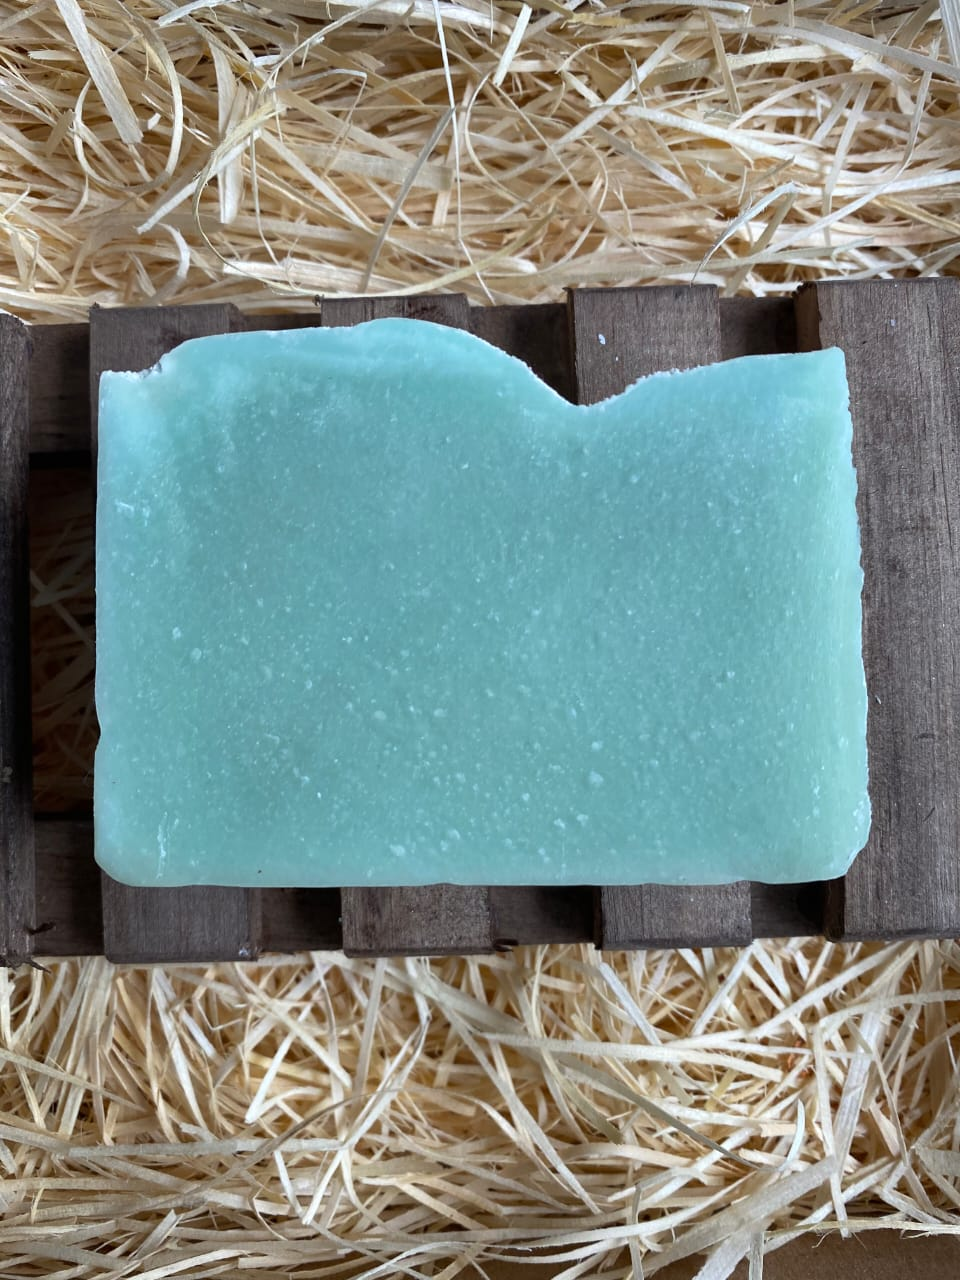 Kitchen Soap para peles delicadas - Sabão Limpeza doméstica